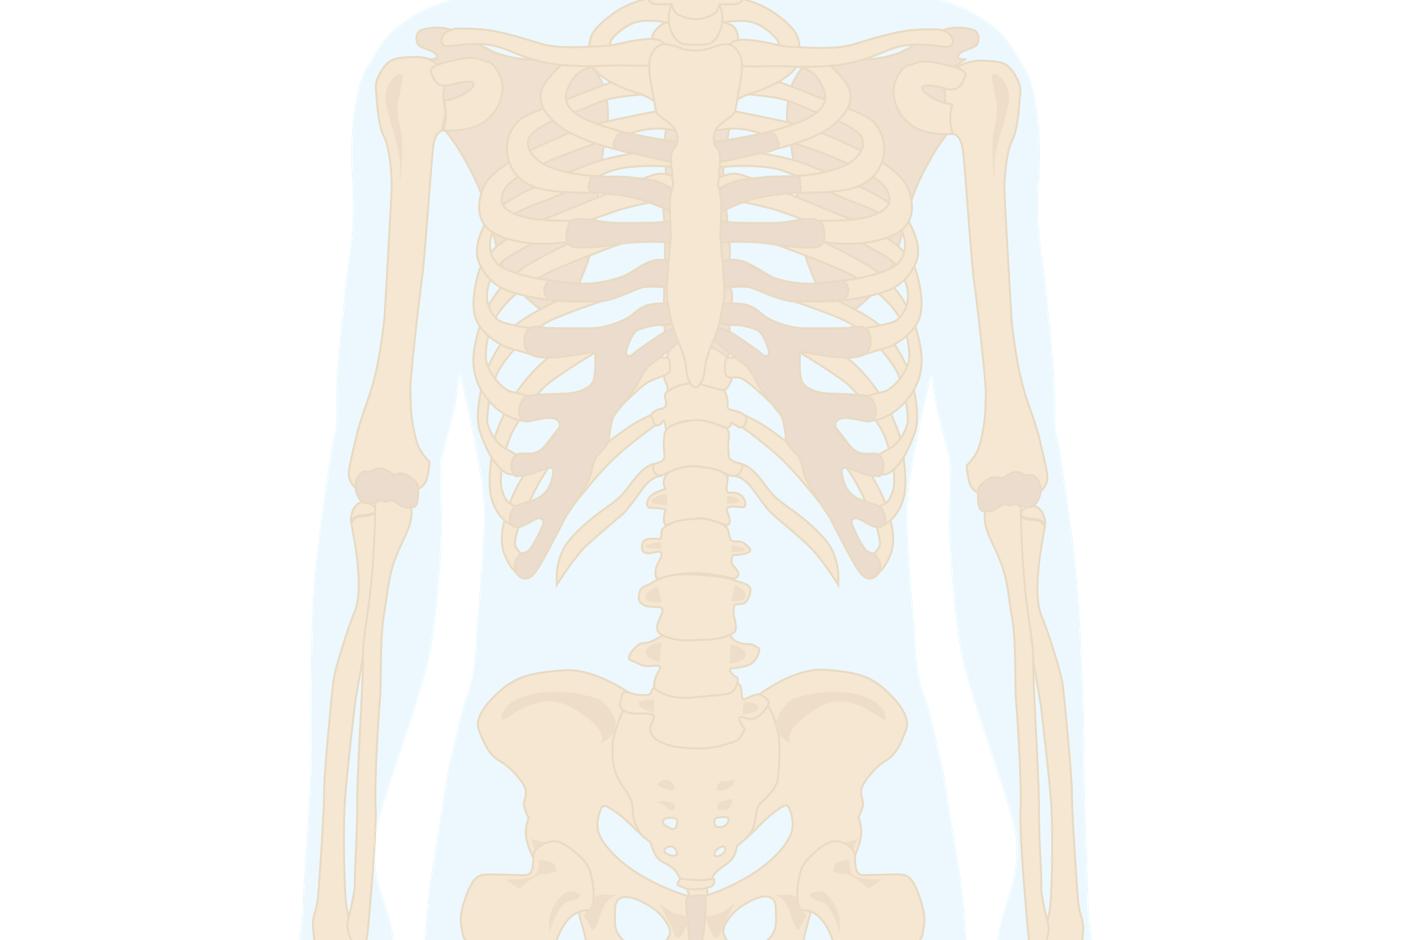 ont i skelettet i armarna